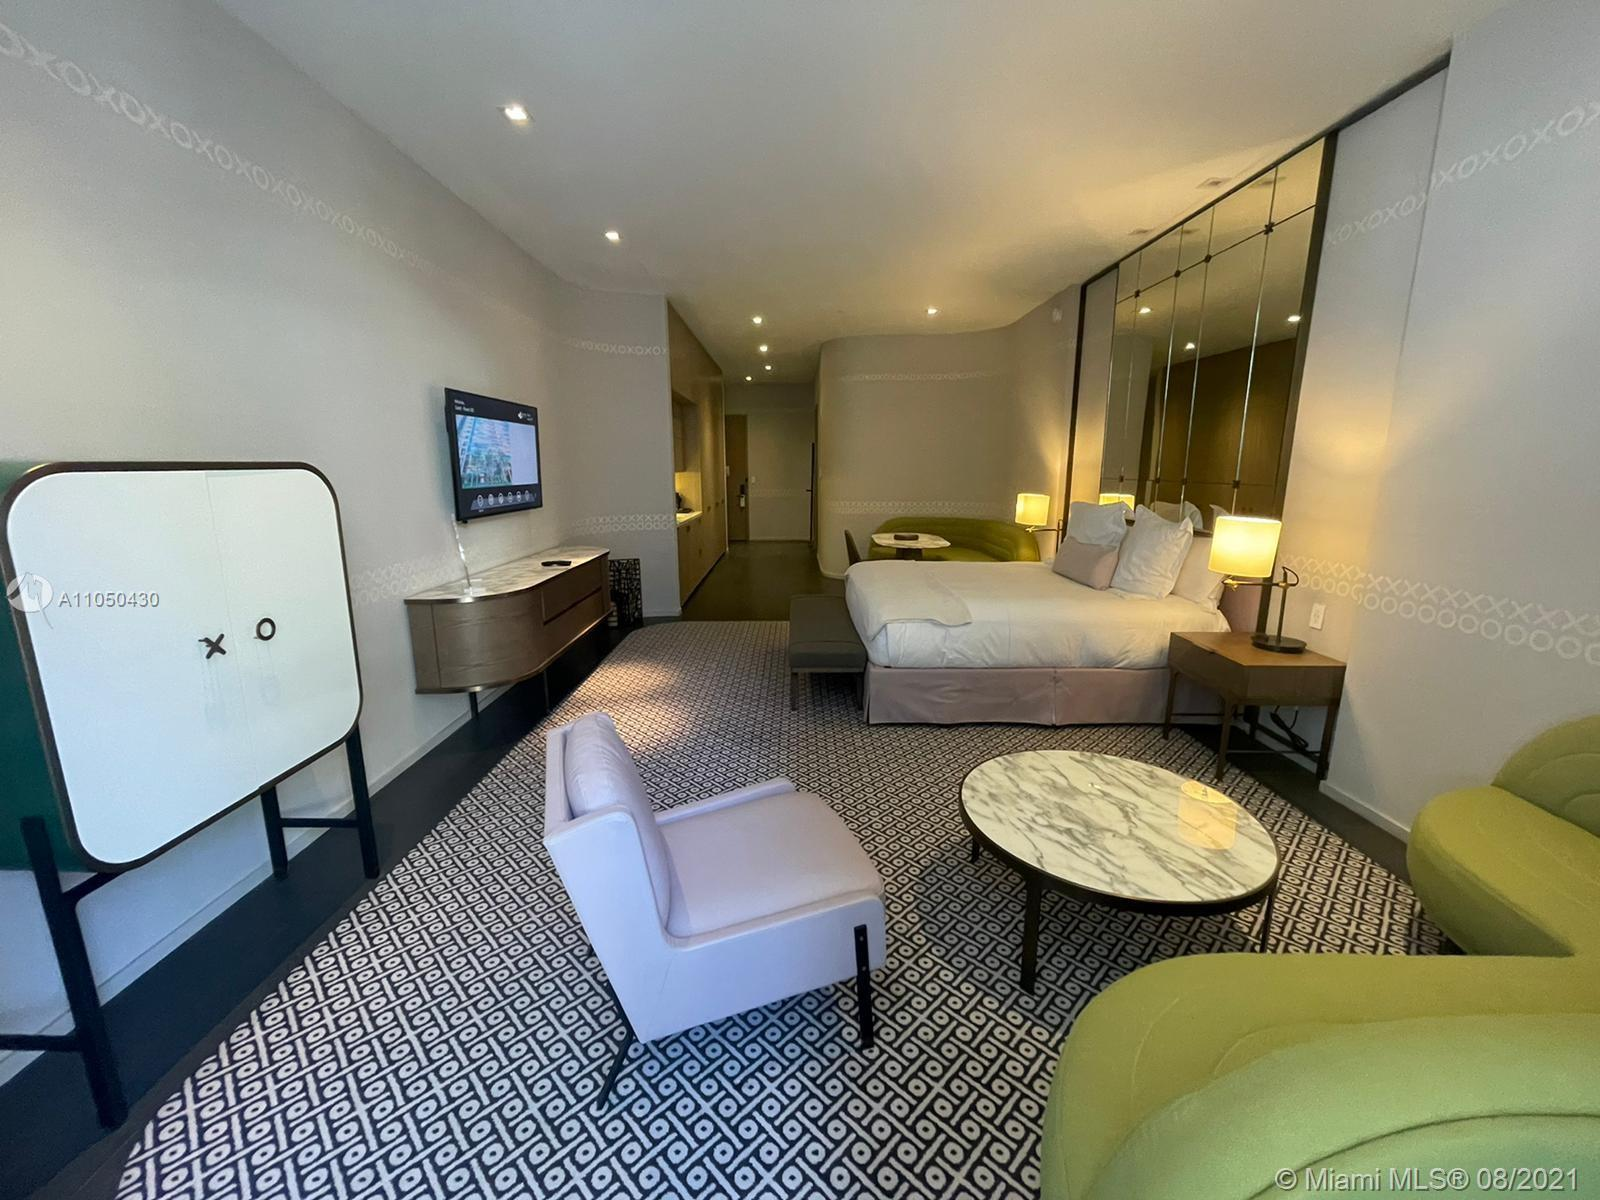 3 Номера в отеле SLS LUX Brickell, Майами